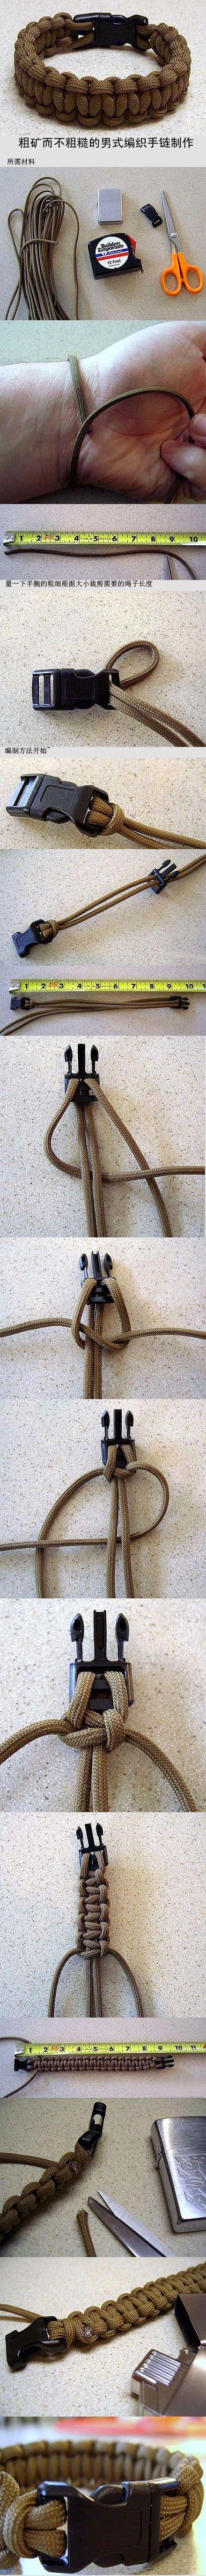 DIY Rough Woven Bracelet DIY Projects / UsefulDIY.com on imgfave